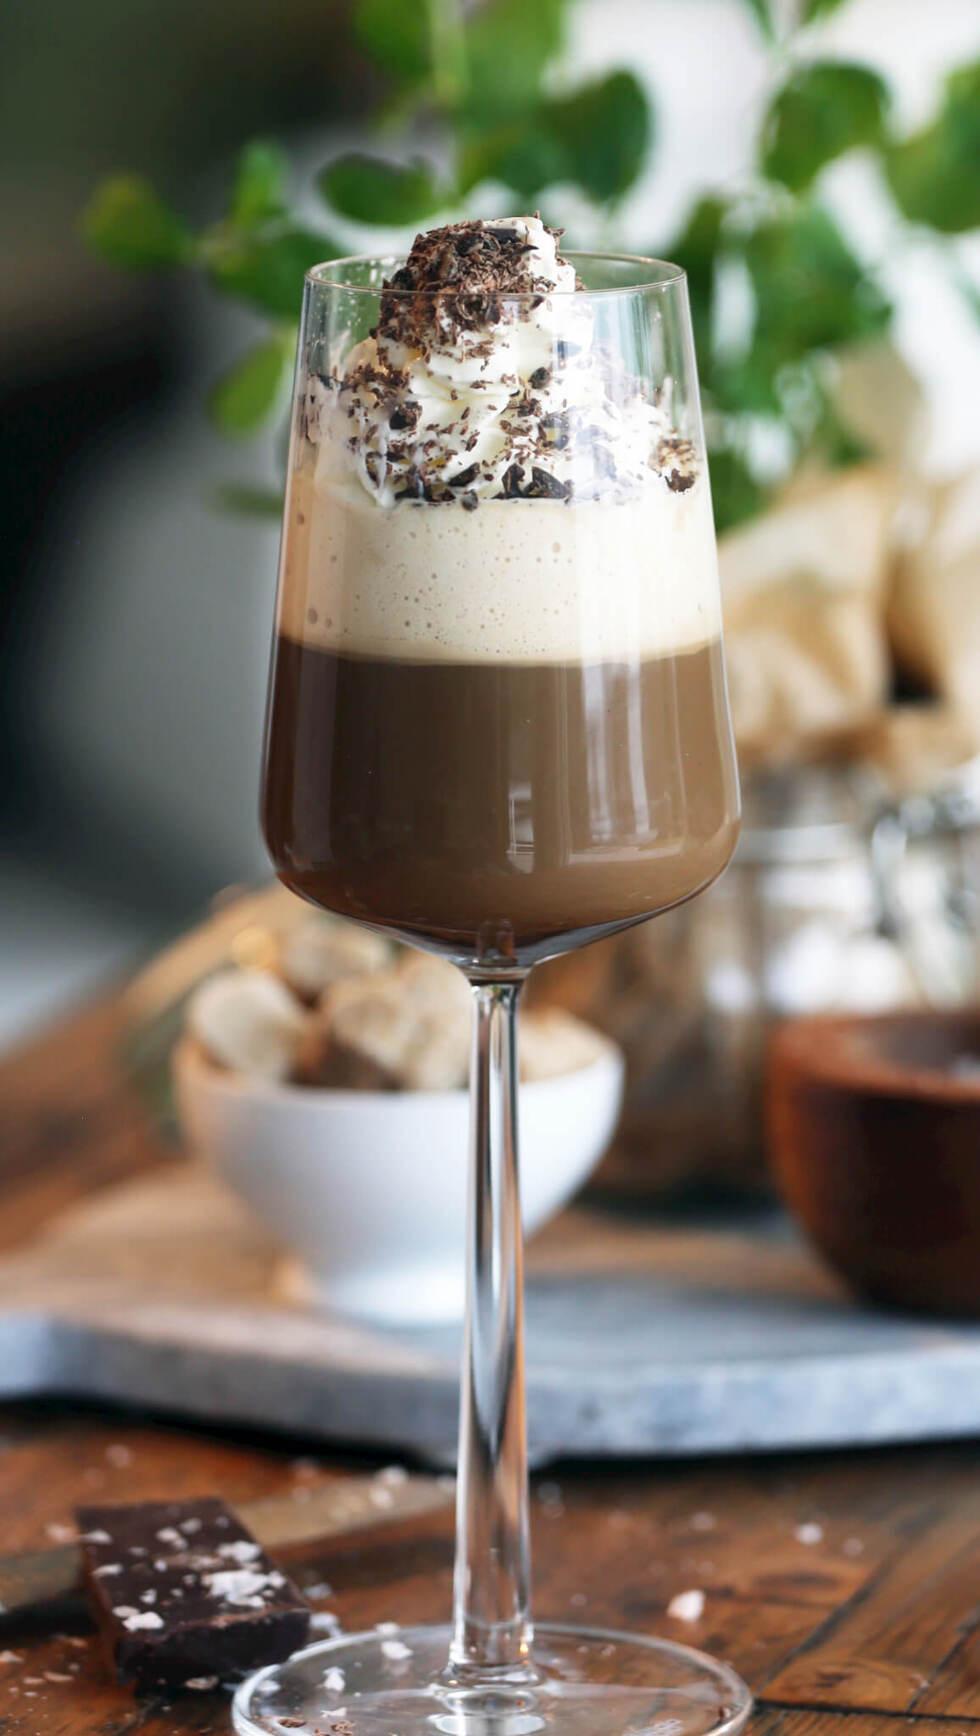 KaffeKarlsson baileys